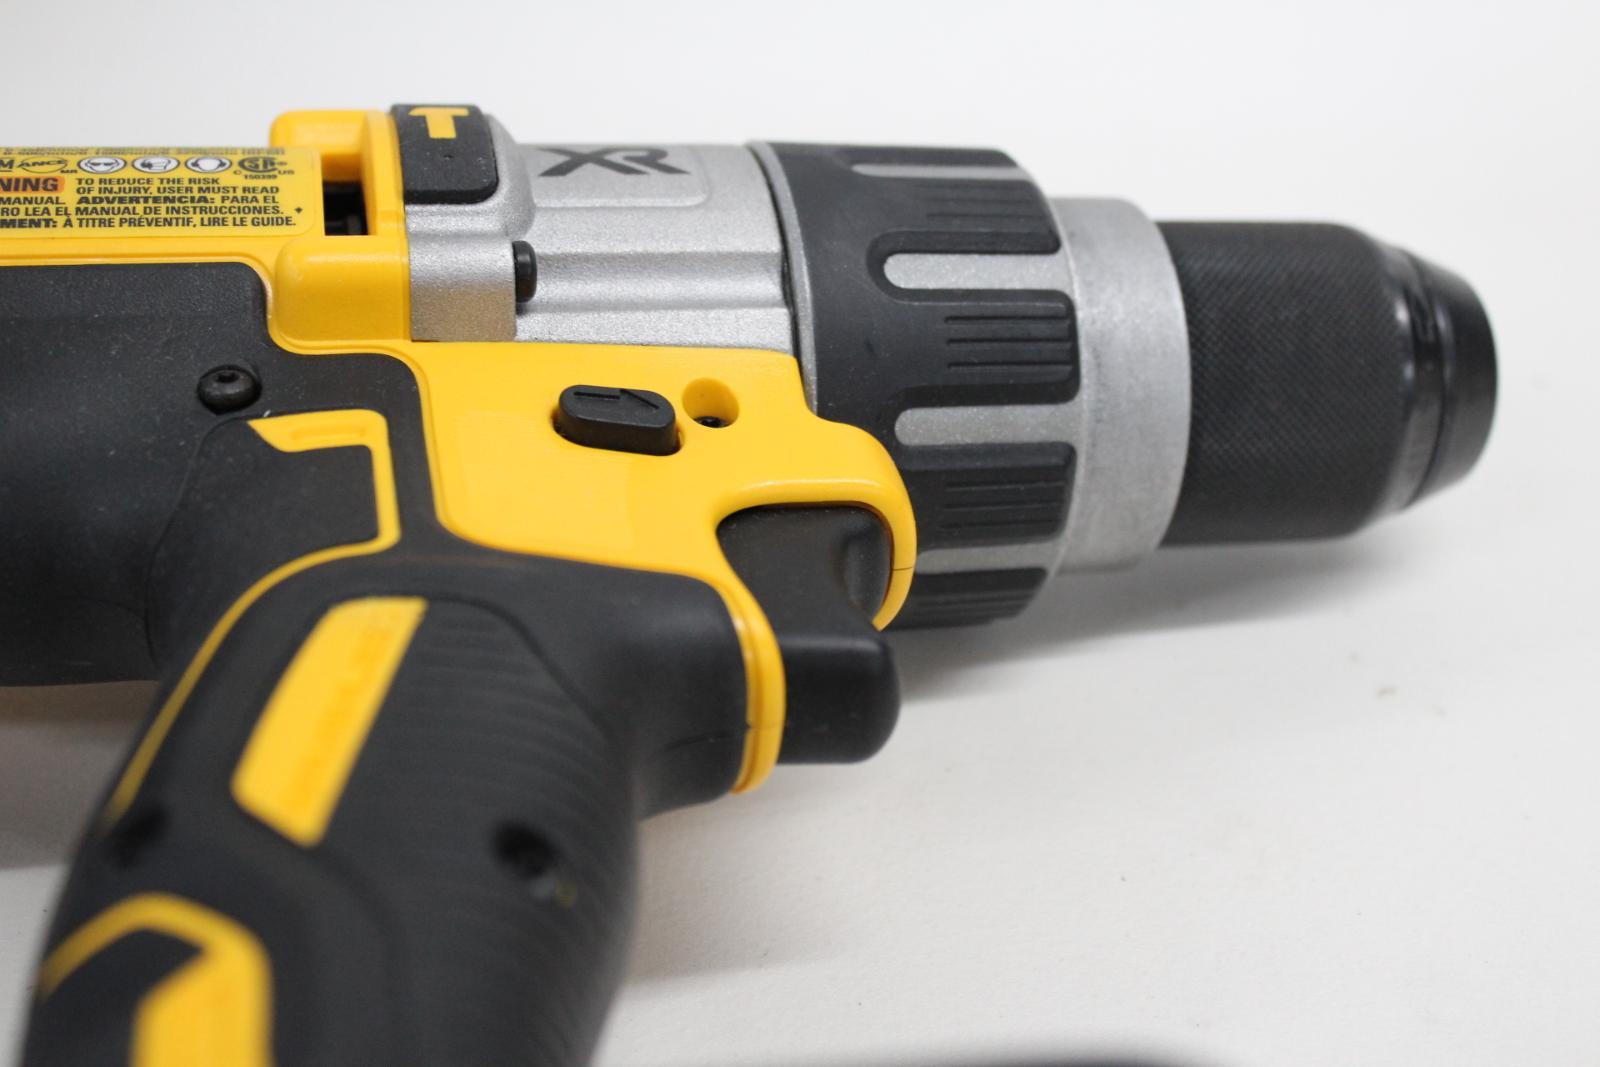 DEWALT-1-2-034-Brushless-Xr-Martillo-Taladro-Inalambrico-Controlador-Inalambrico-Modelo-DCD996-20v miniatura 9